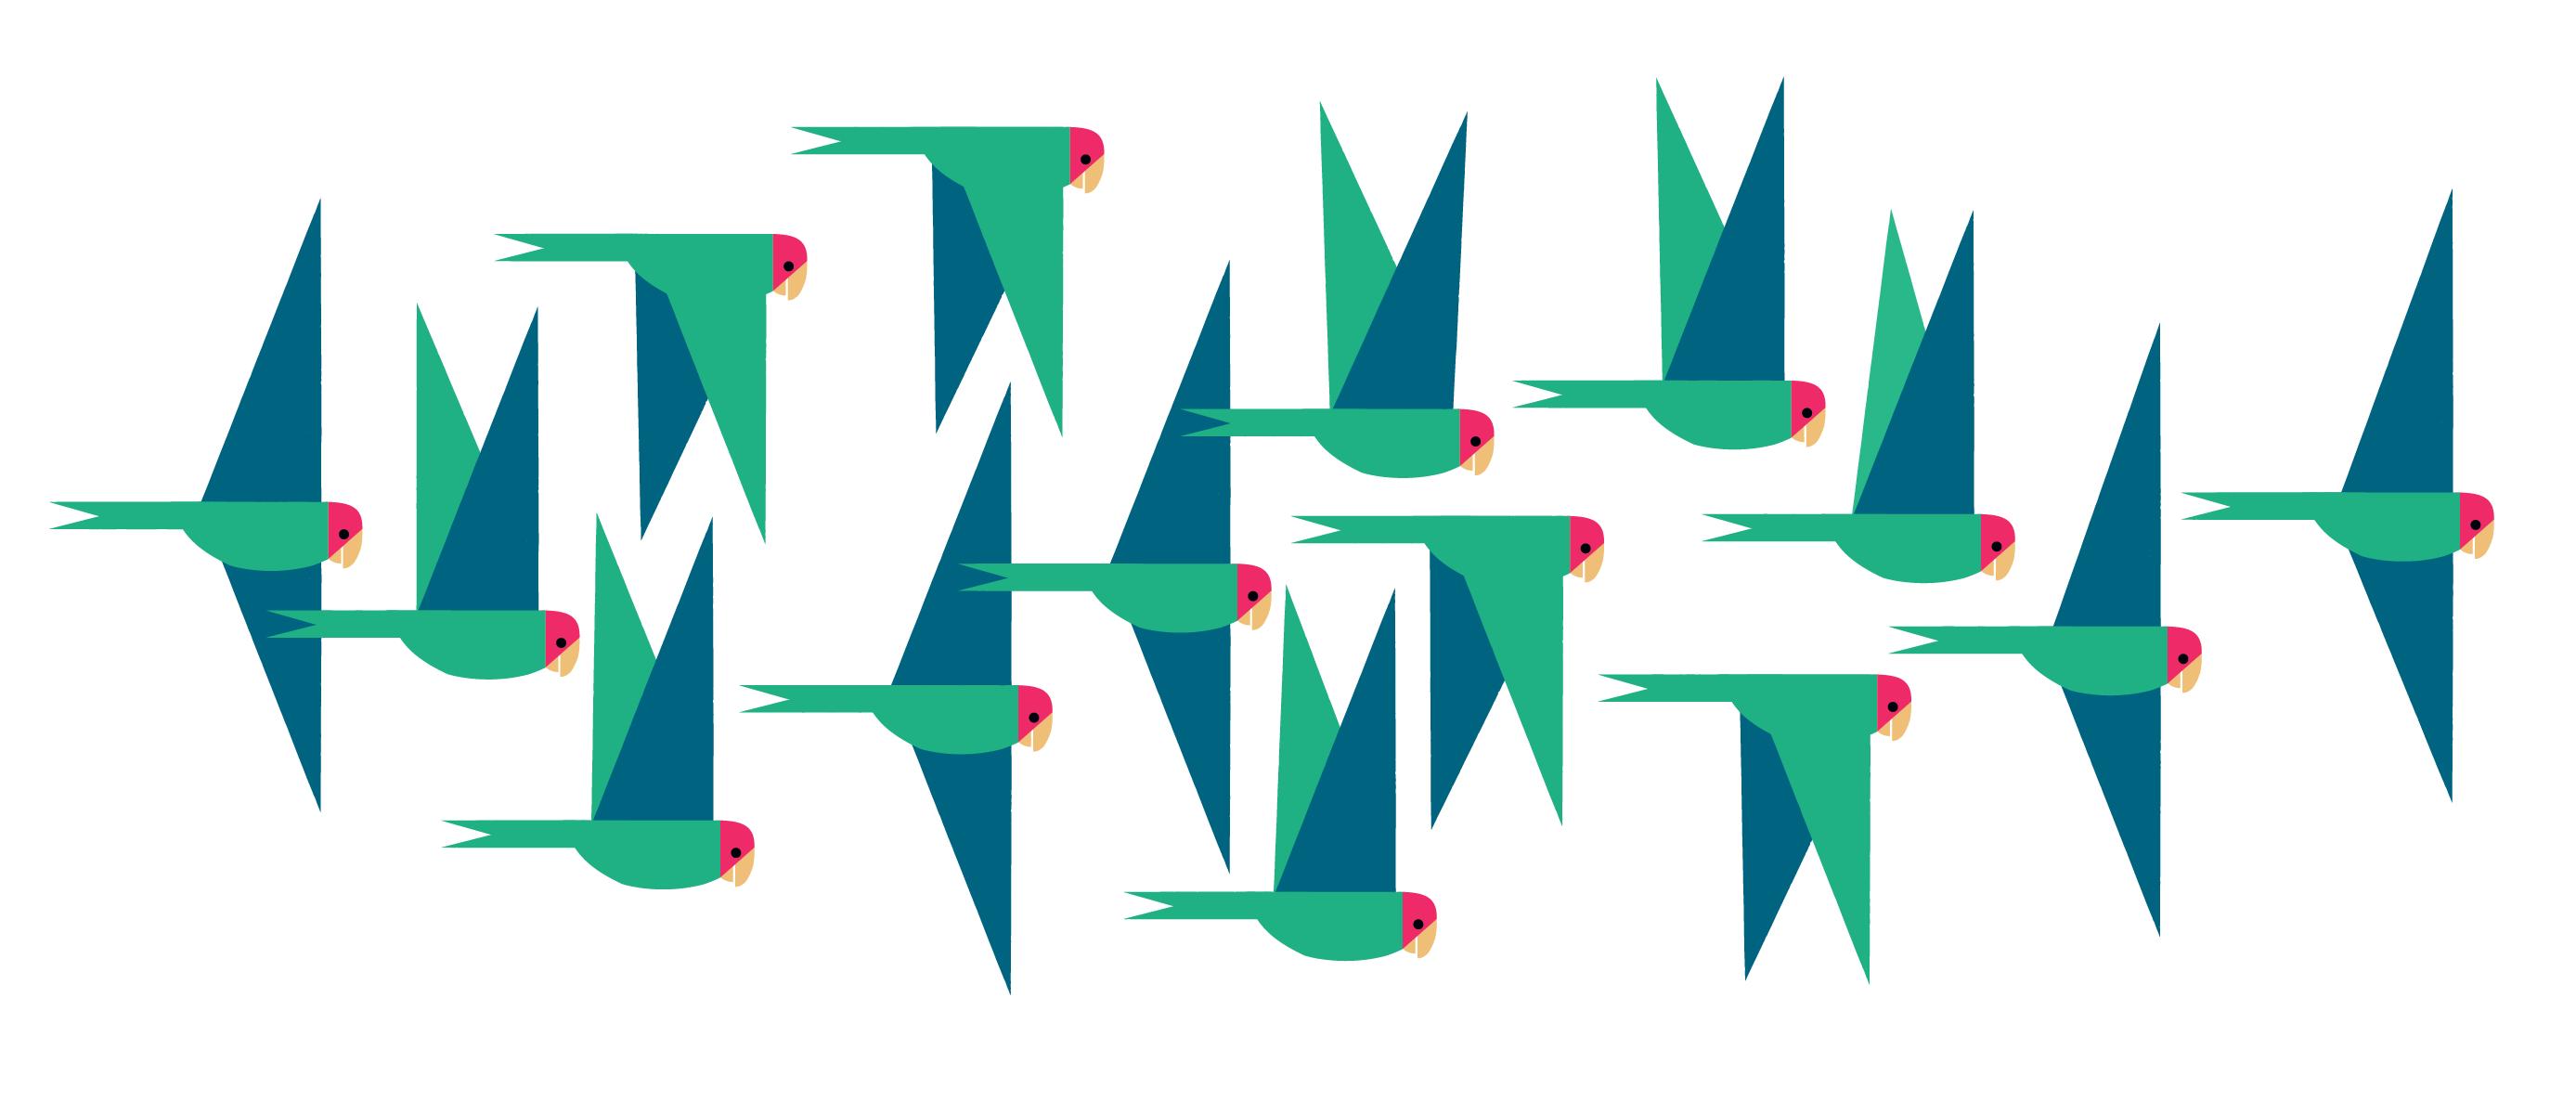 Green-Parrots-by-Alexander-Vidal-mug-01.png